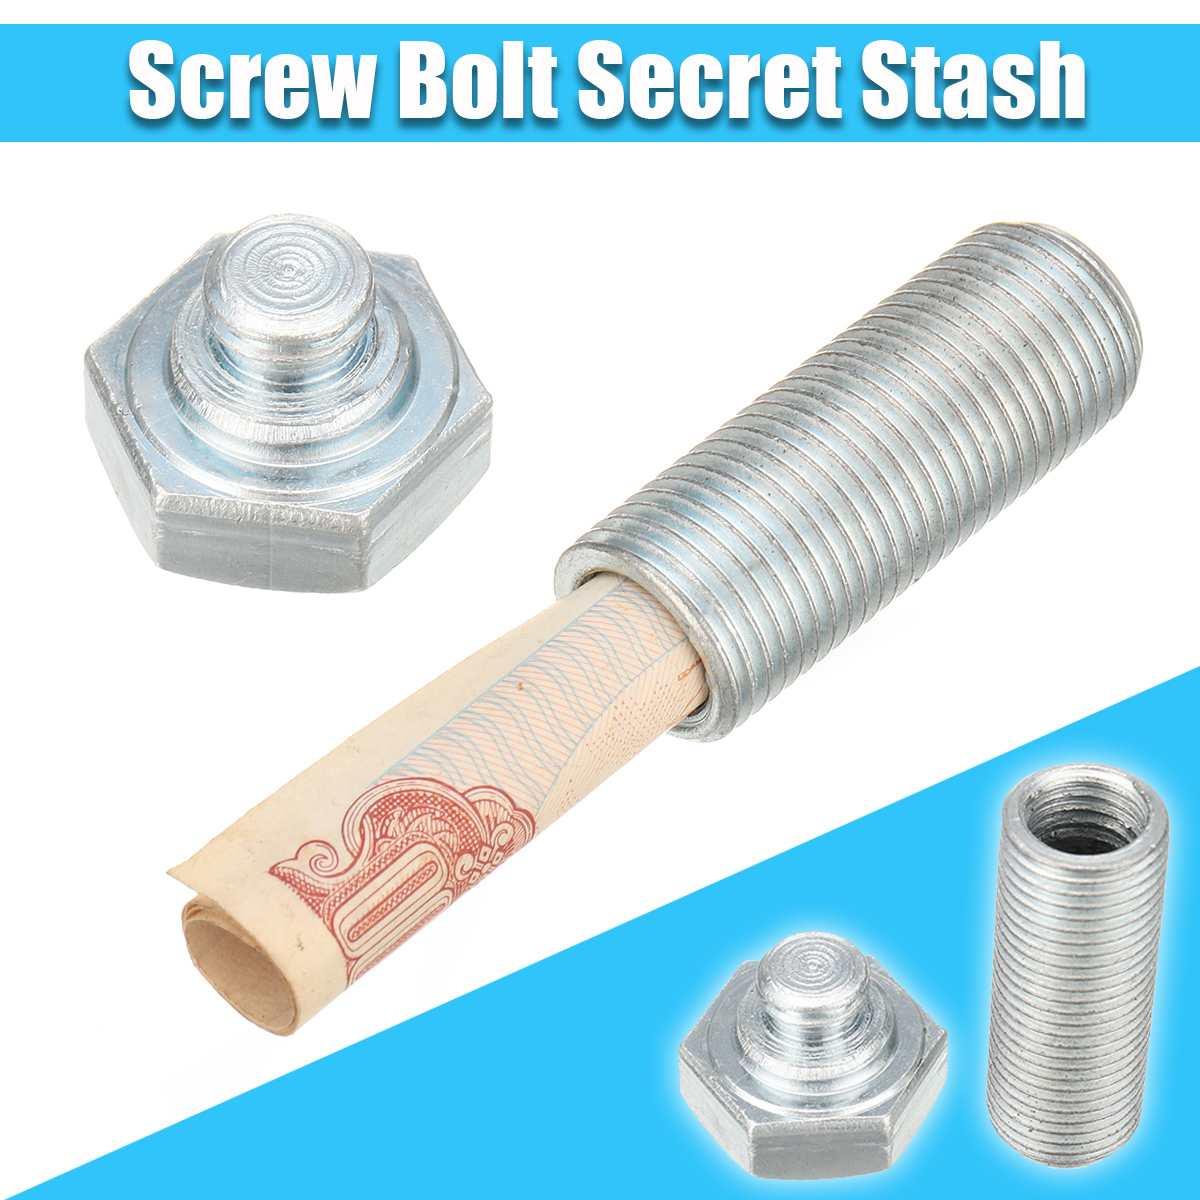 Bolt Nut Screw Pill Box Secret Stash Diversion Cash Money Safe Hiddens Compartment Box For Kid Gift Security Safe